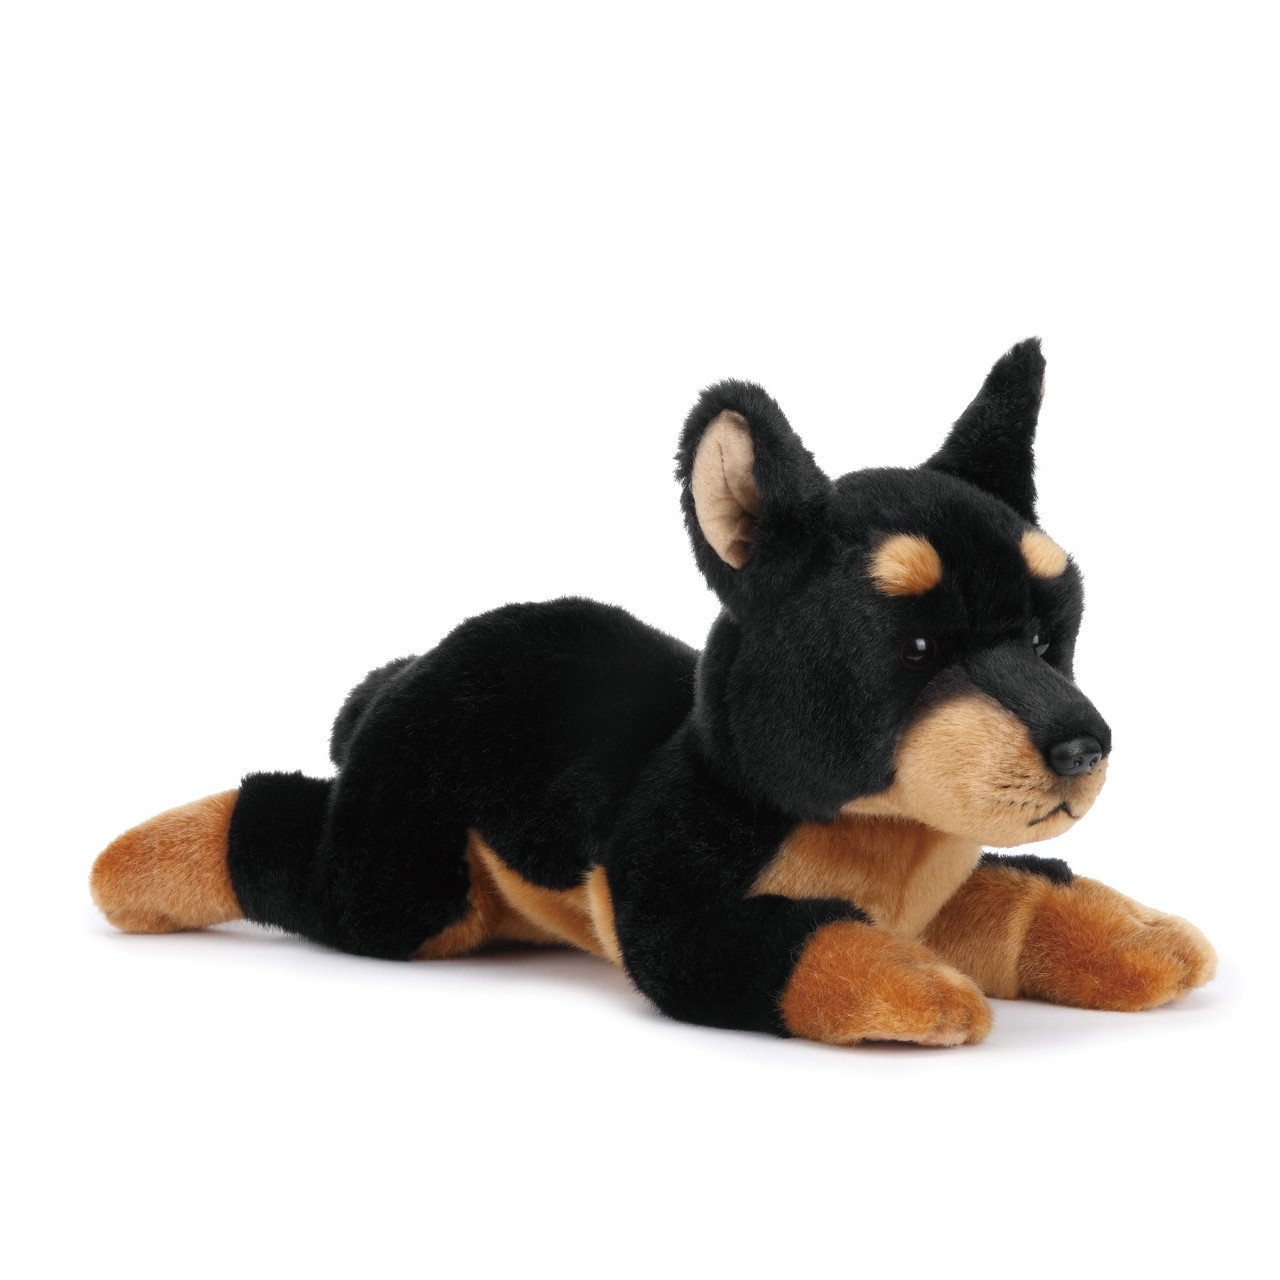 NAT and Jules Alert Large Doberman Pinscher Dog Children's Plush Stuffed Animal Toy by Demdaco (Image #1)